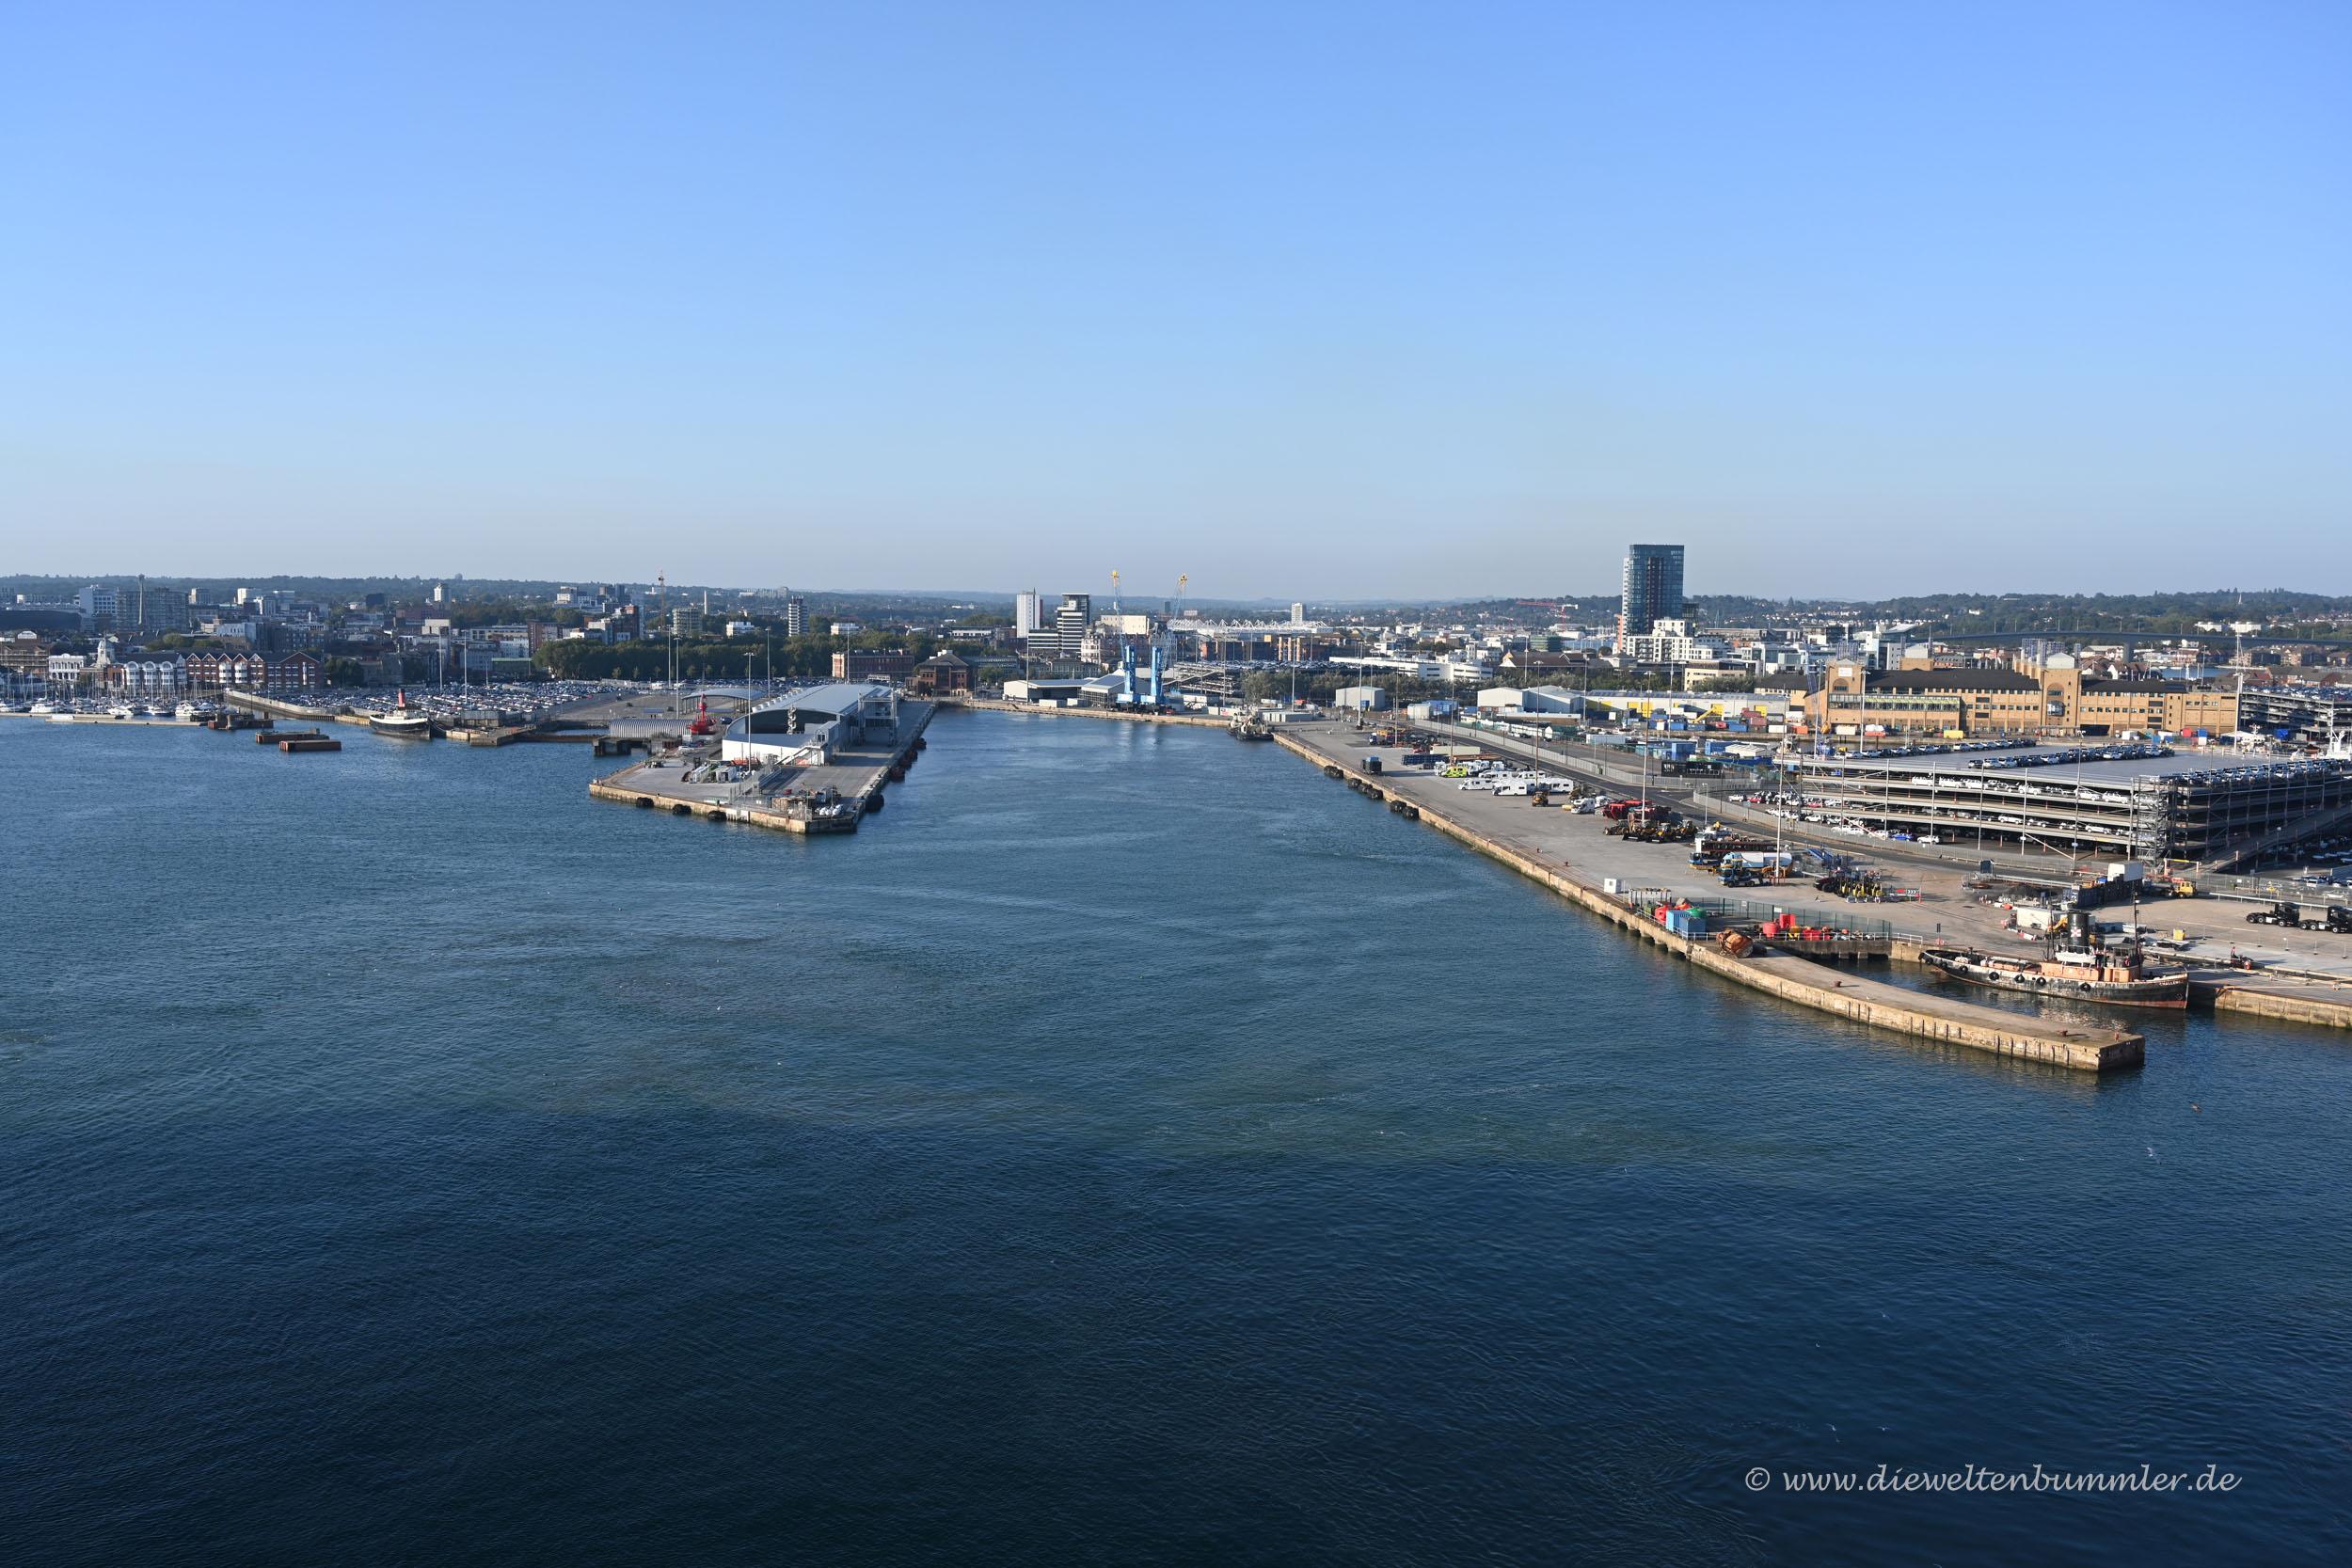 Hafen von Southampton